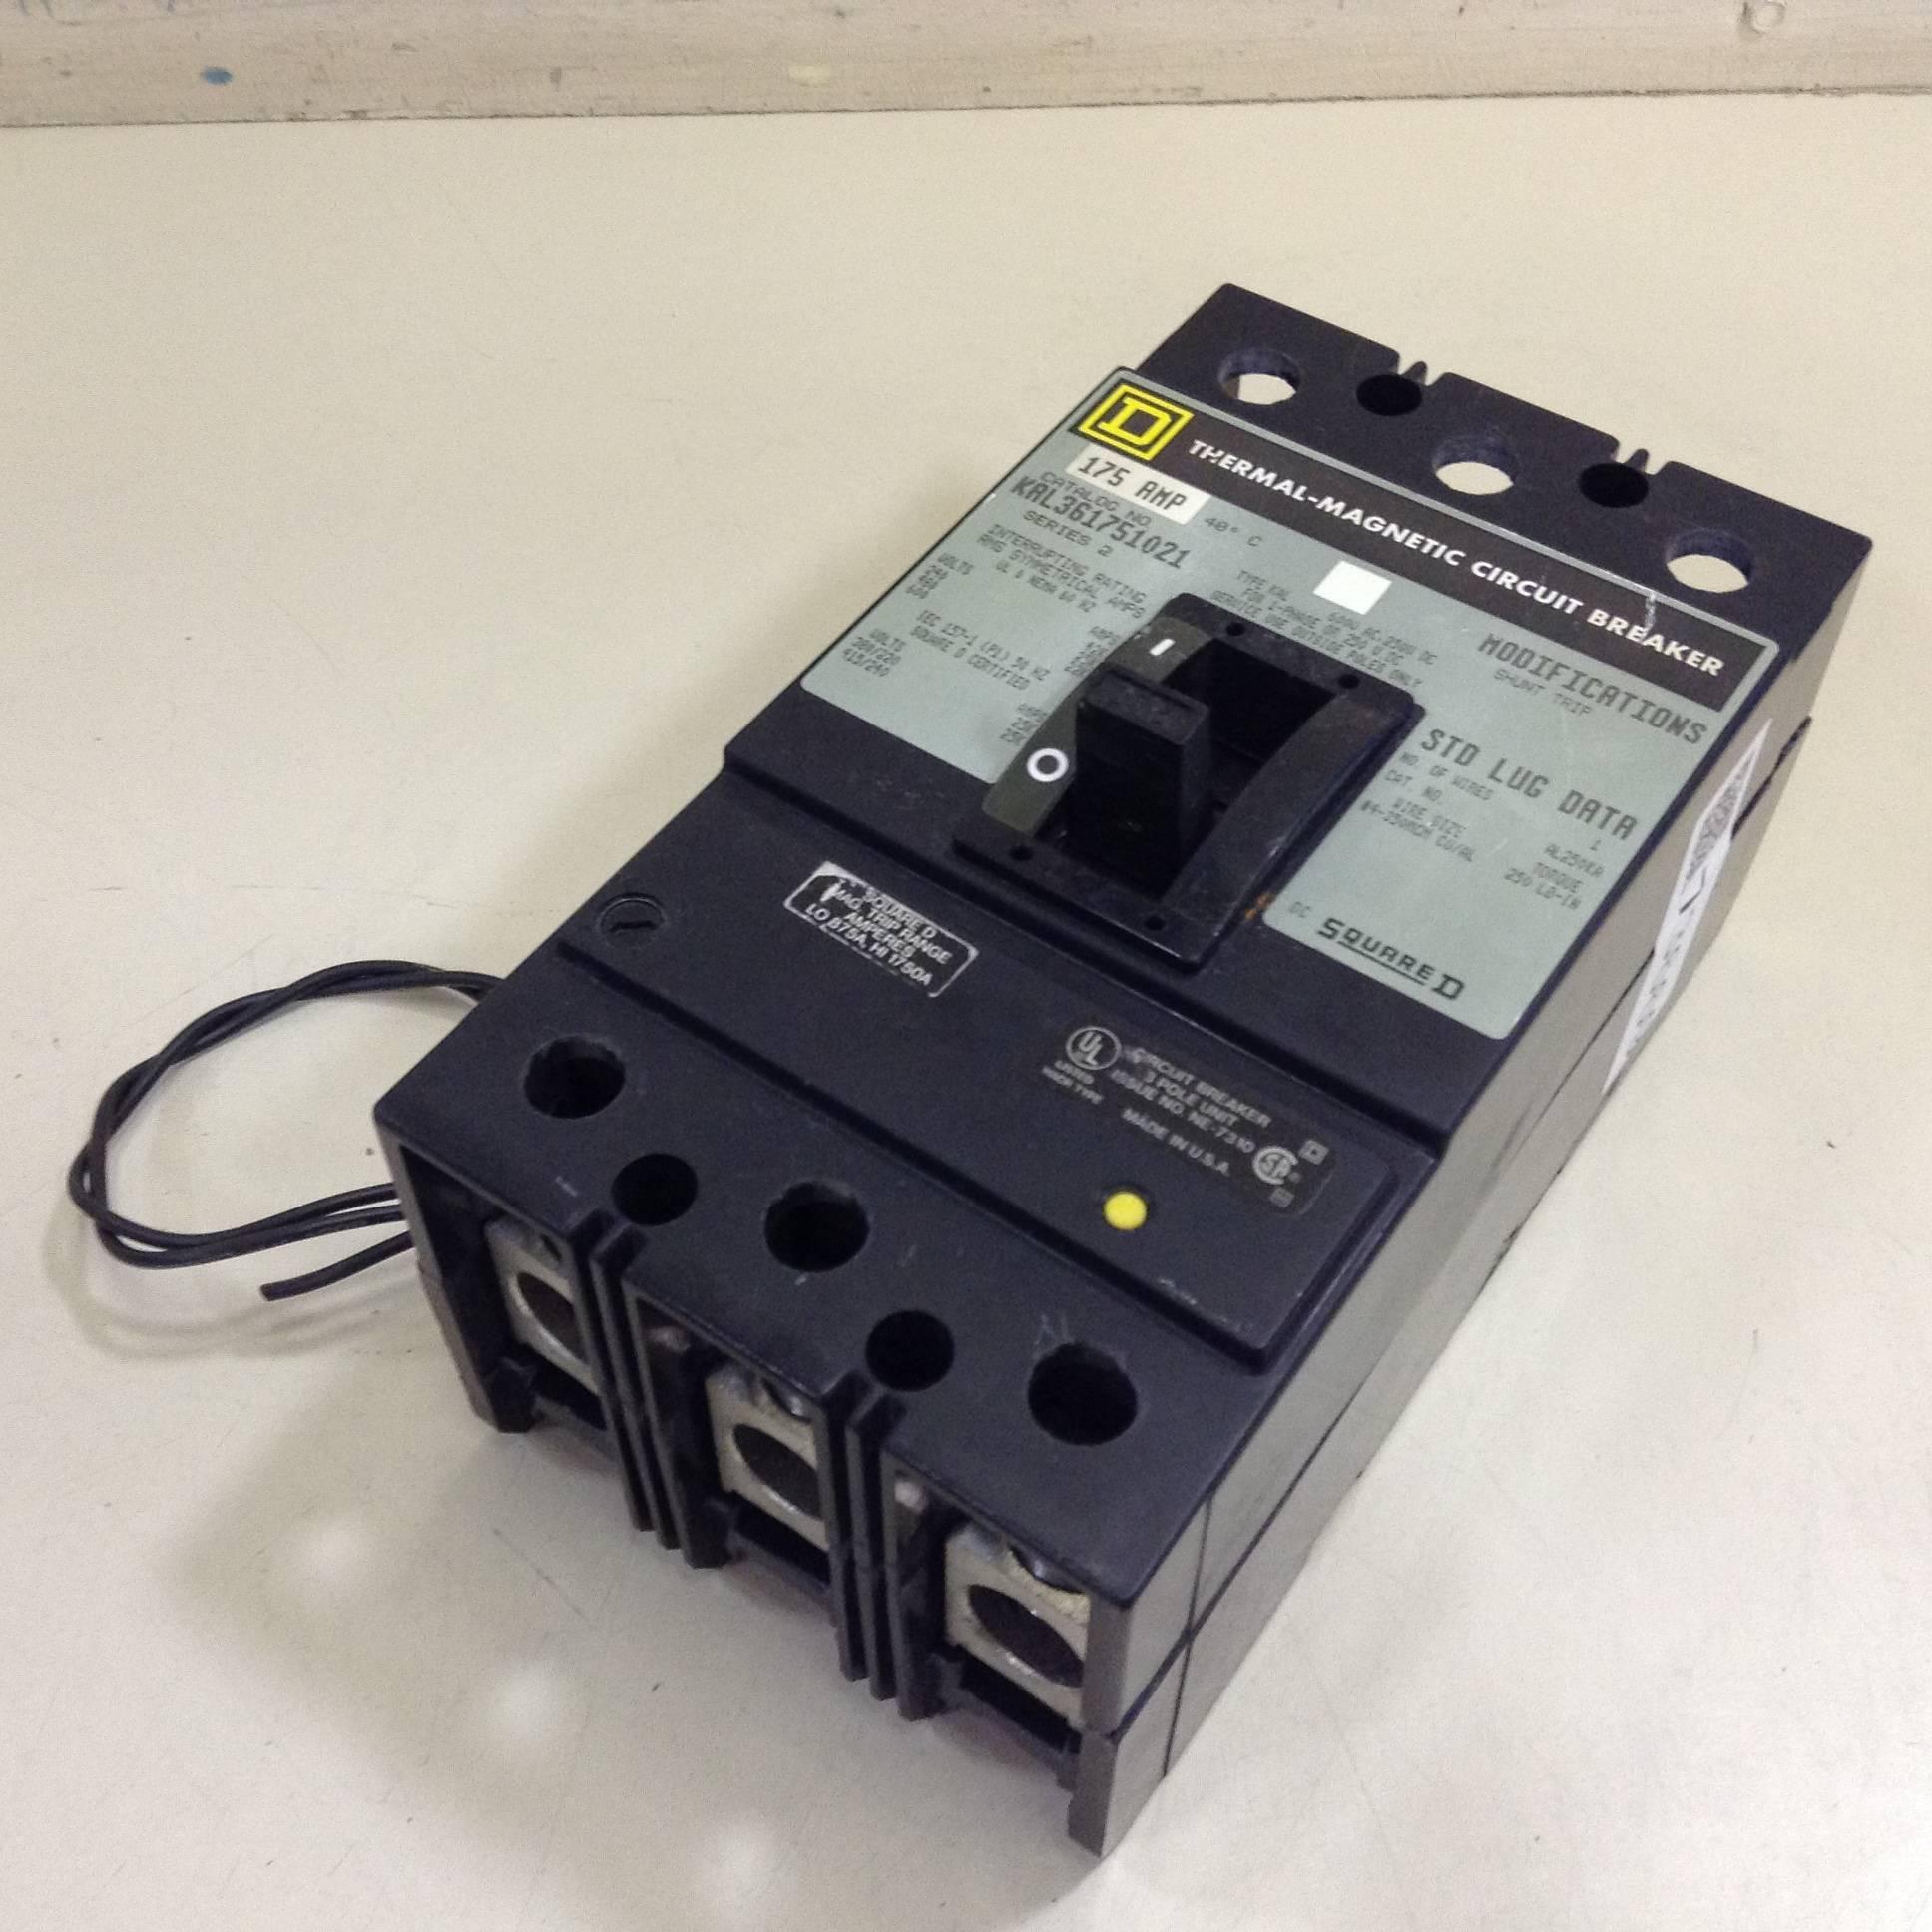 Square D 175 Amp Circuit Breaker KAL361751021 Used #73669 eBay #787341